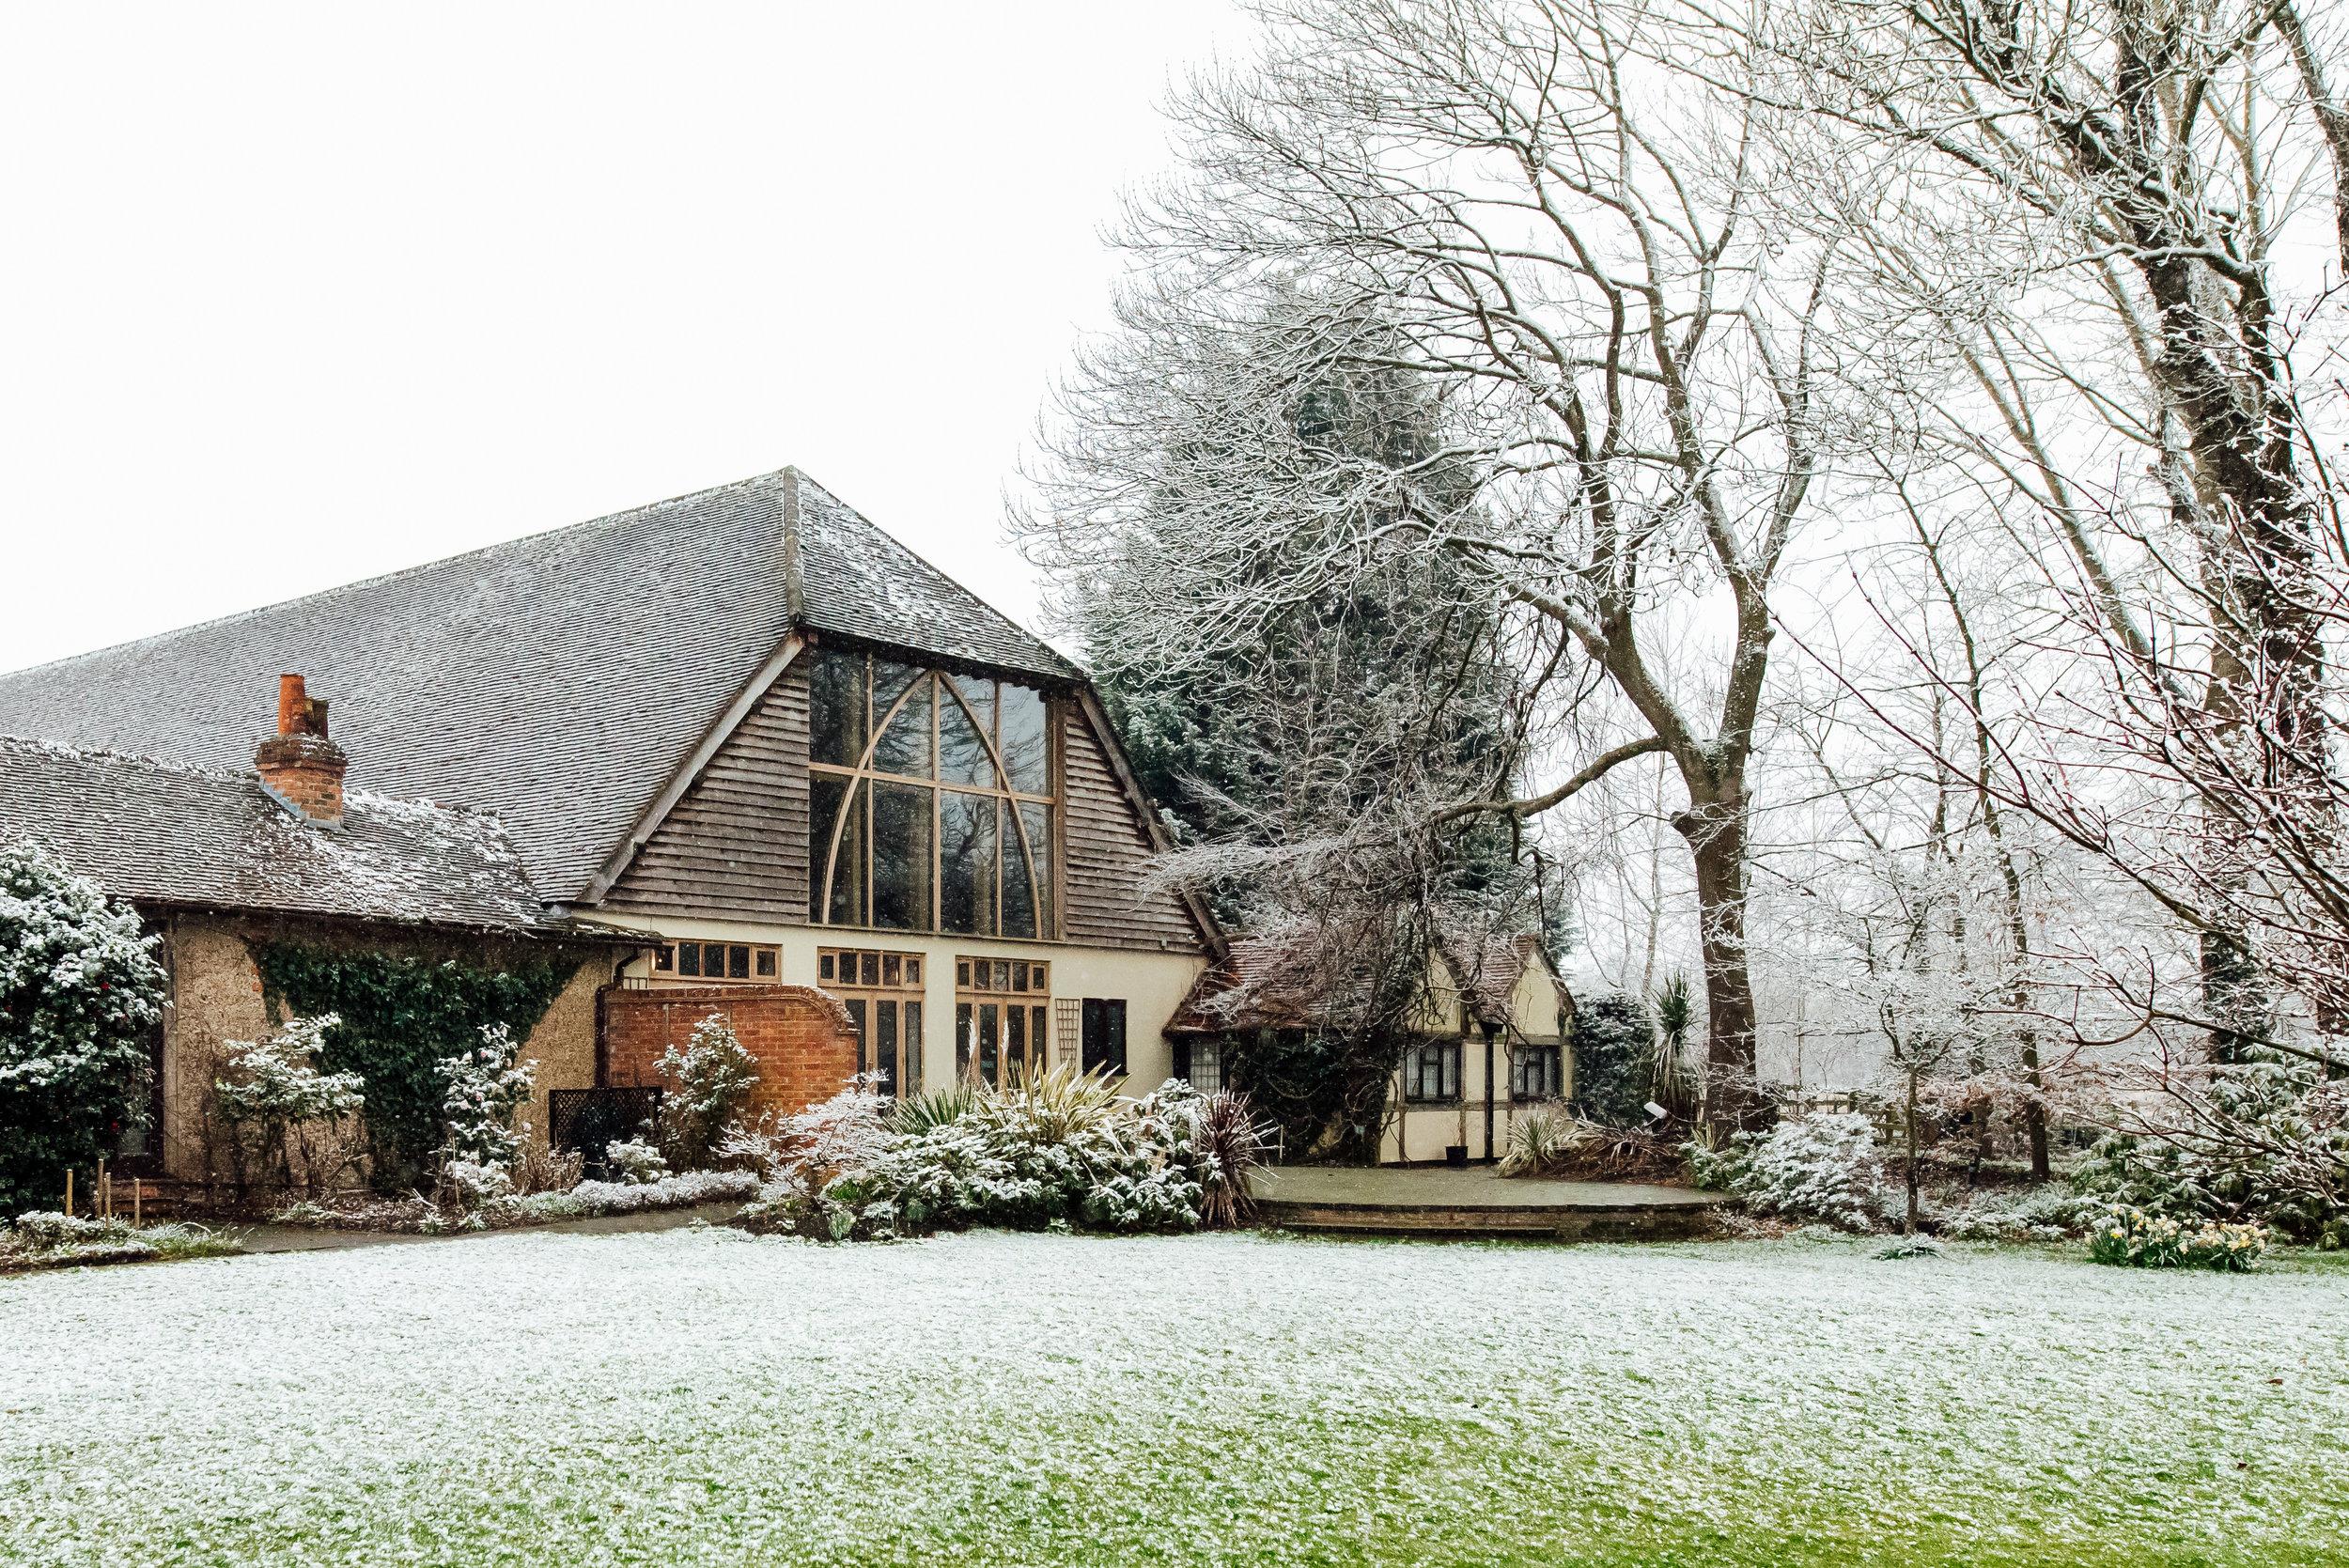 Sarah-Fishlock-Photography-Hampshire-wedding-photographer-hampshire / fleet-wedding-photographer-fleet / rivervale-barn-wedding-photographer / hampshire-barn-wedding-venue / hampshire-wedding-venue / barn-wedding-hampshire / rivervale-barn / wedding-in-the-snow